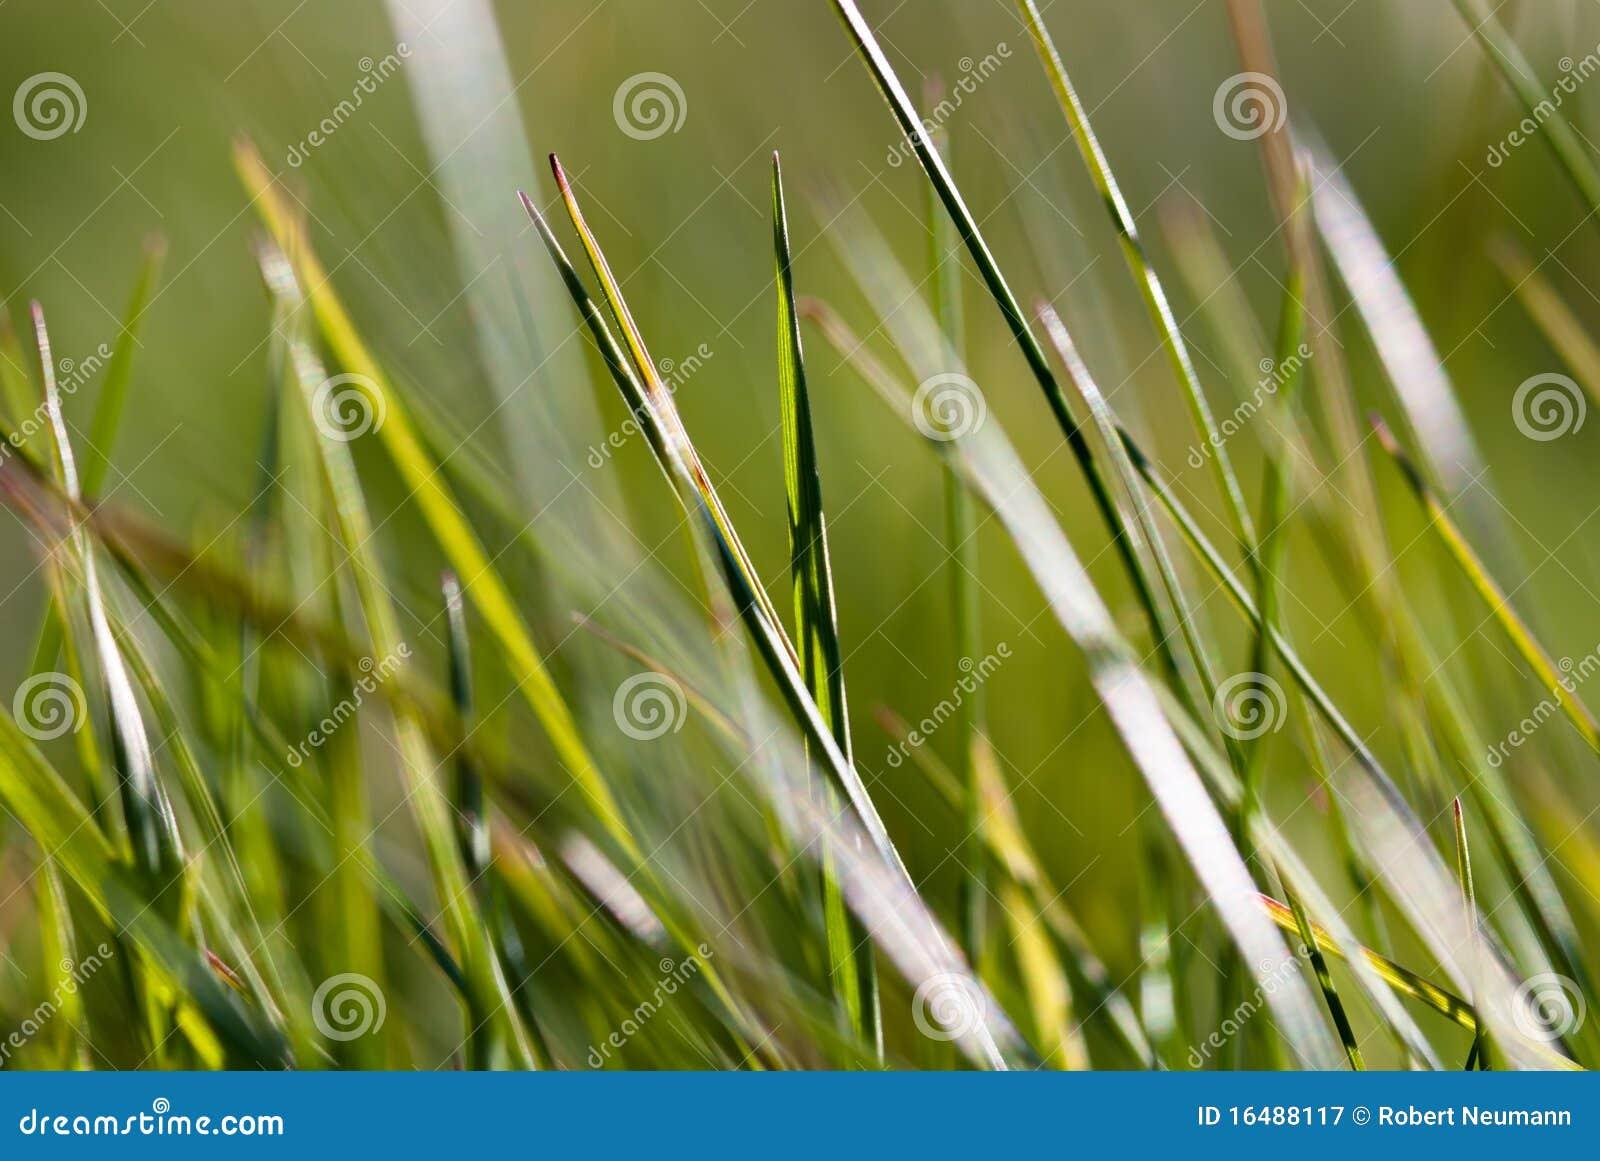 grass macro photography - photo #47